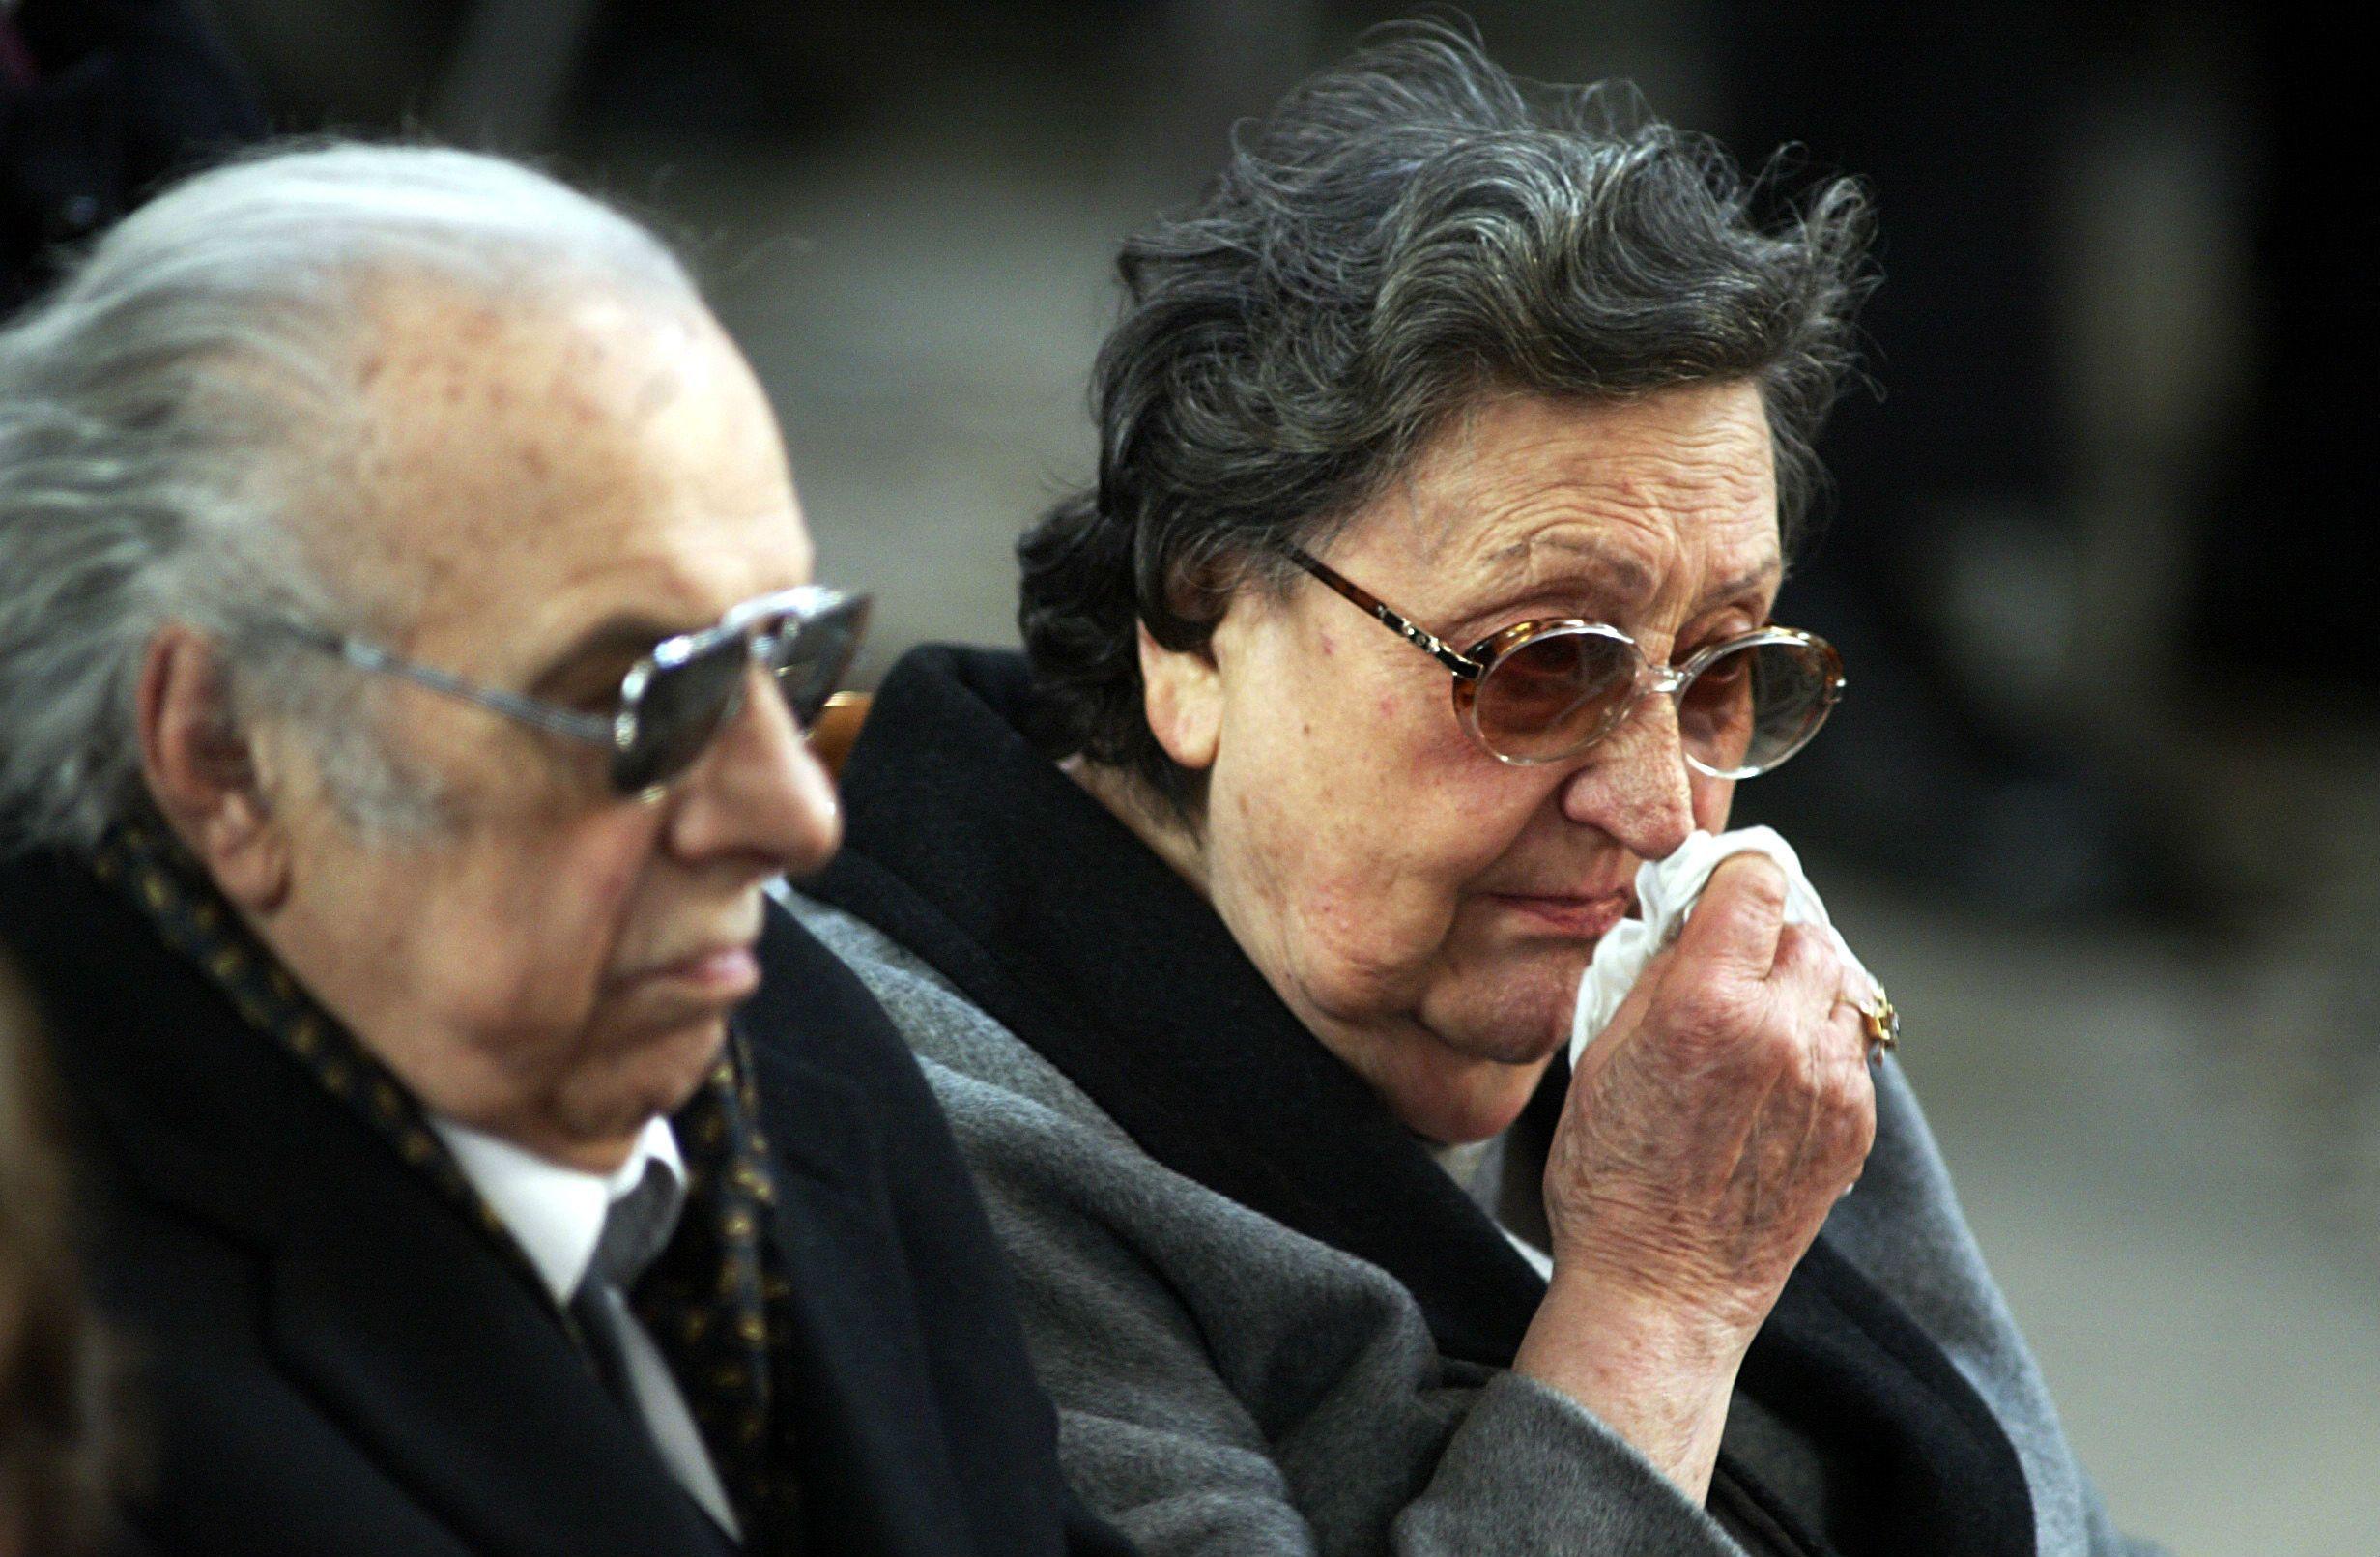 Morta Aurelia Sordi, sorella di Alberto: i funerali martedì mattina, aveva 97 anni